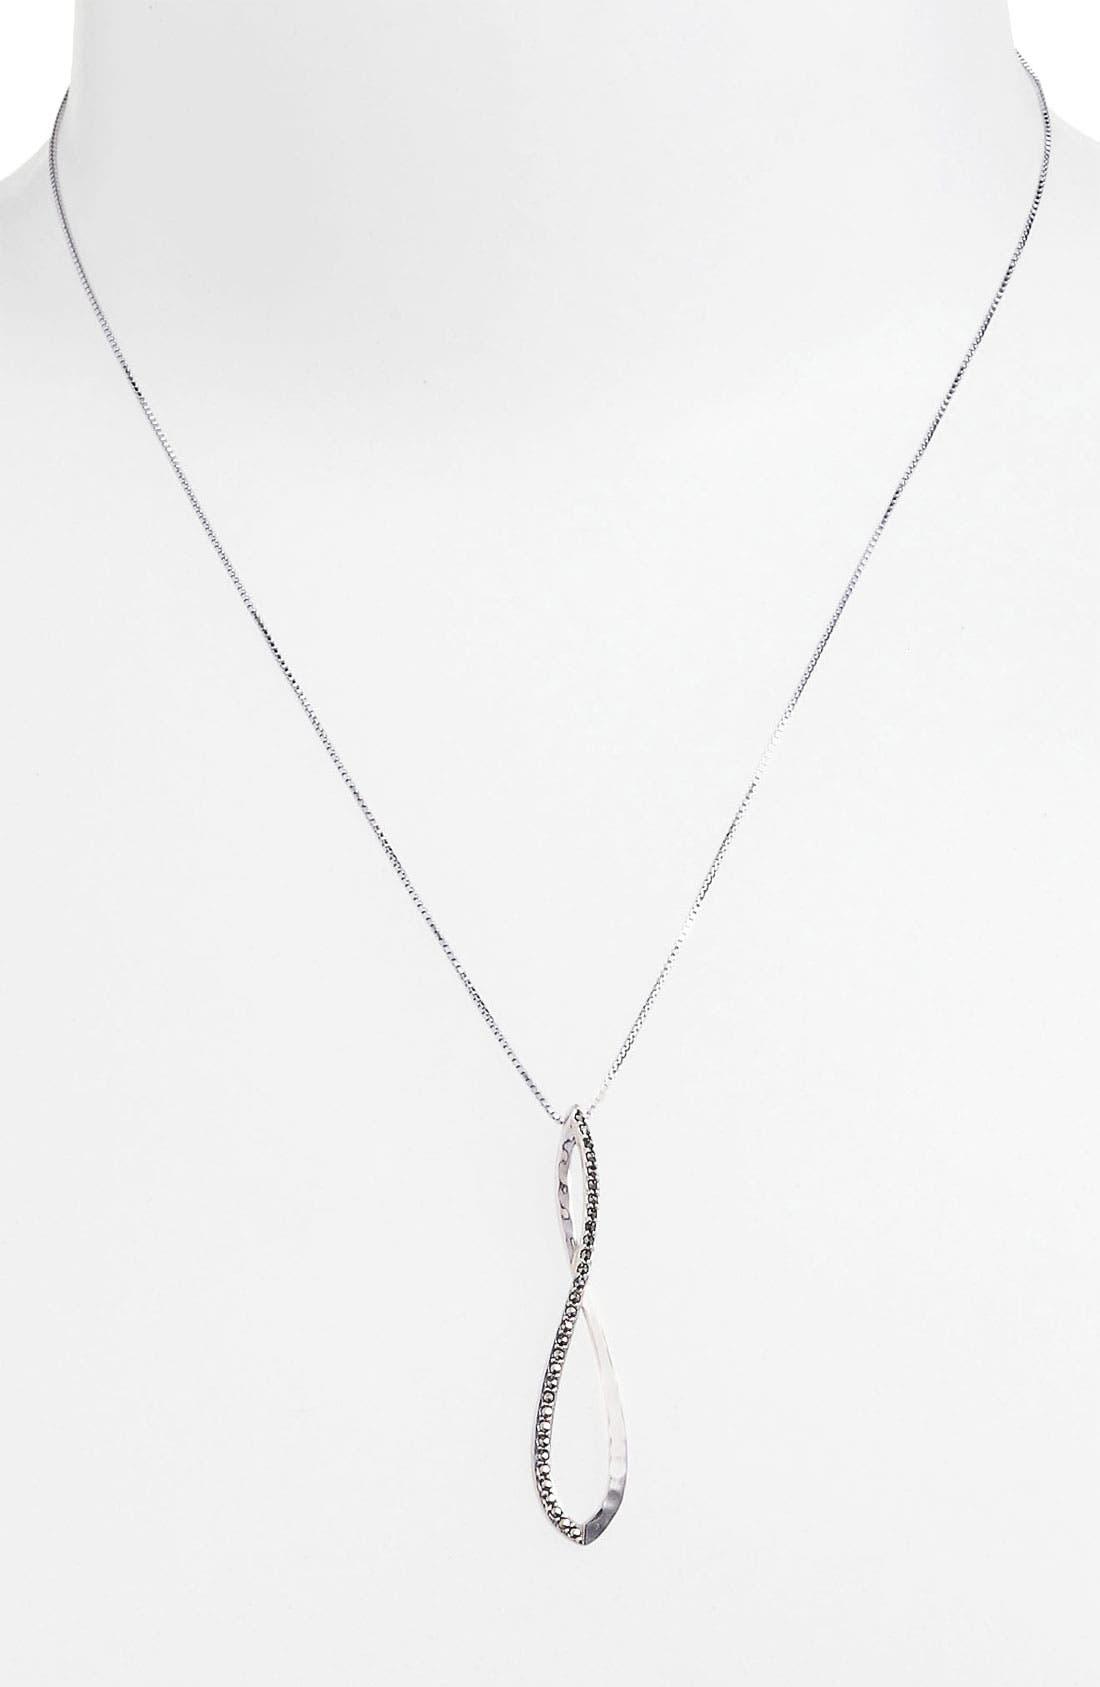 Alternate Image 1 Selected - Judith Jack 'Fluidity' Pendant Necklace